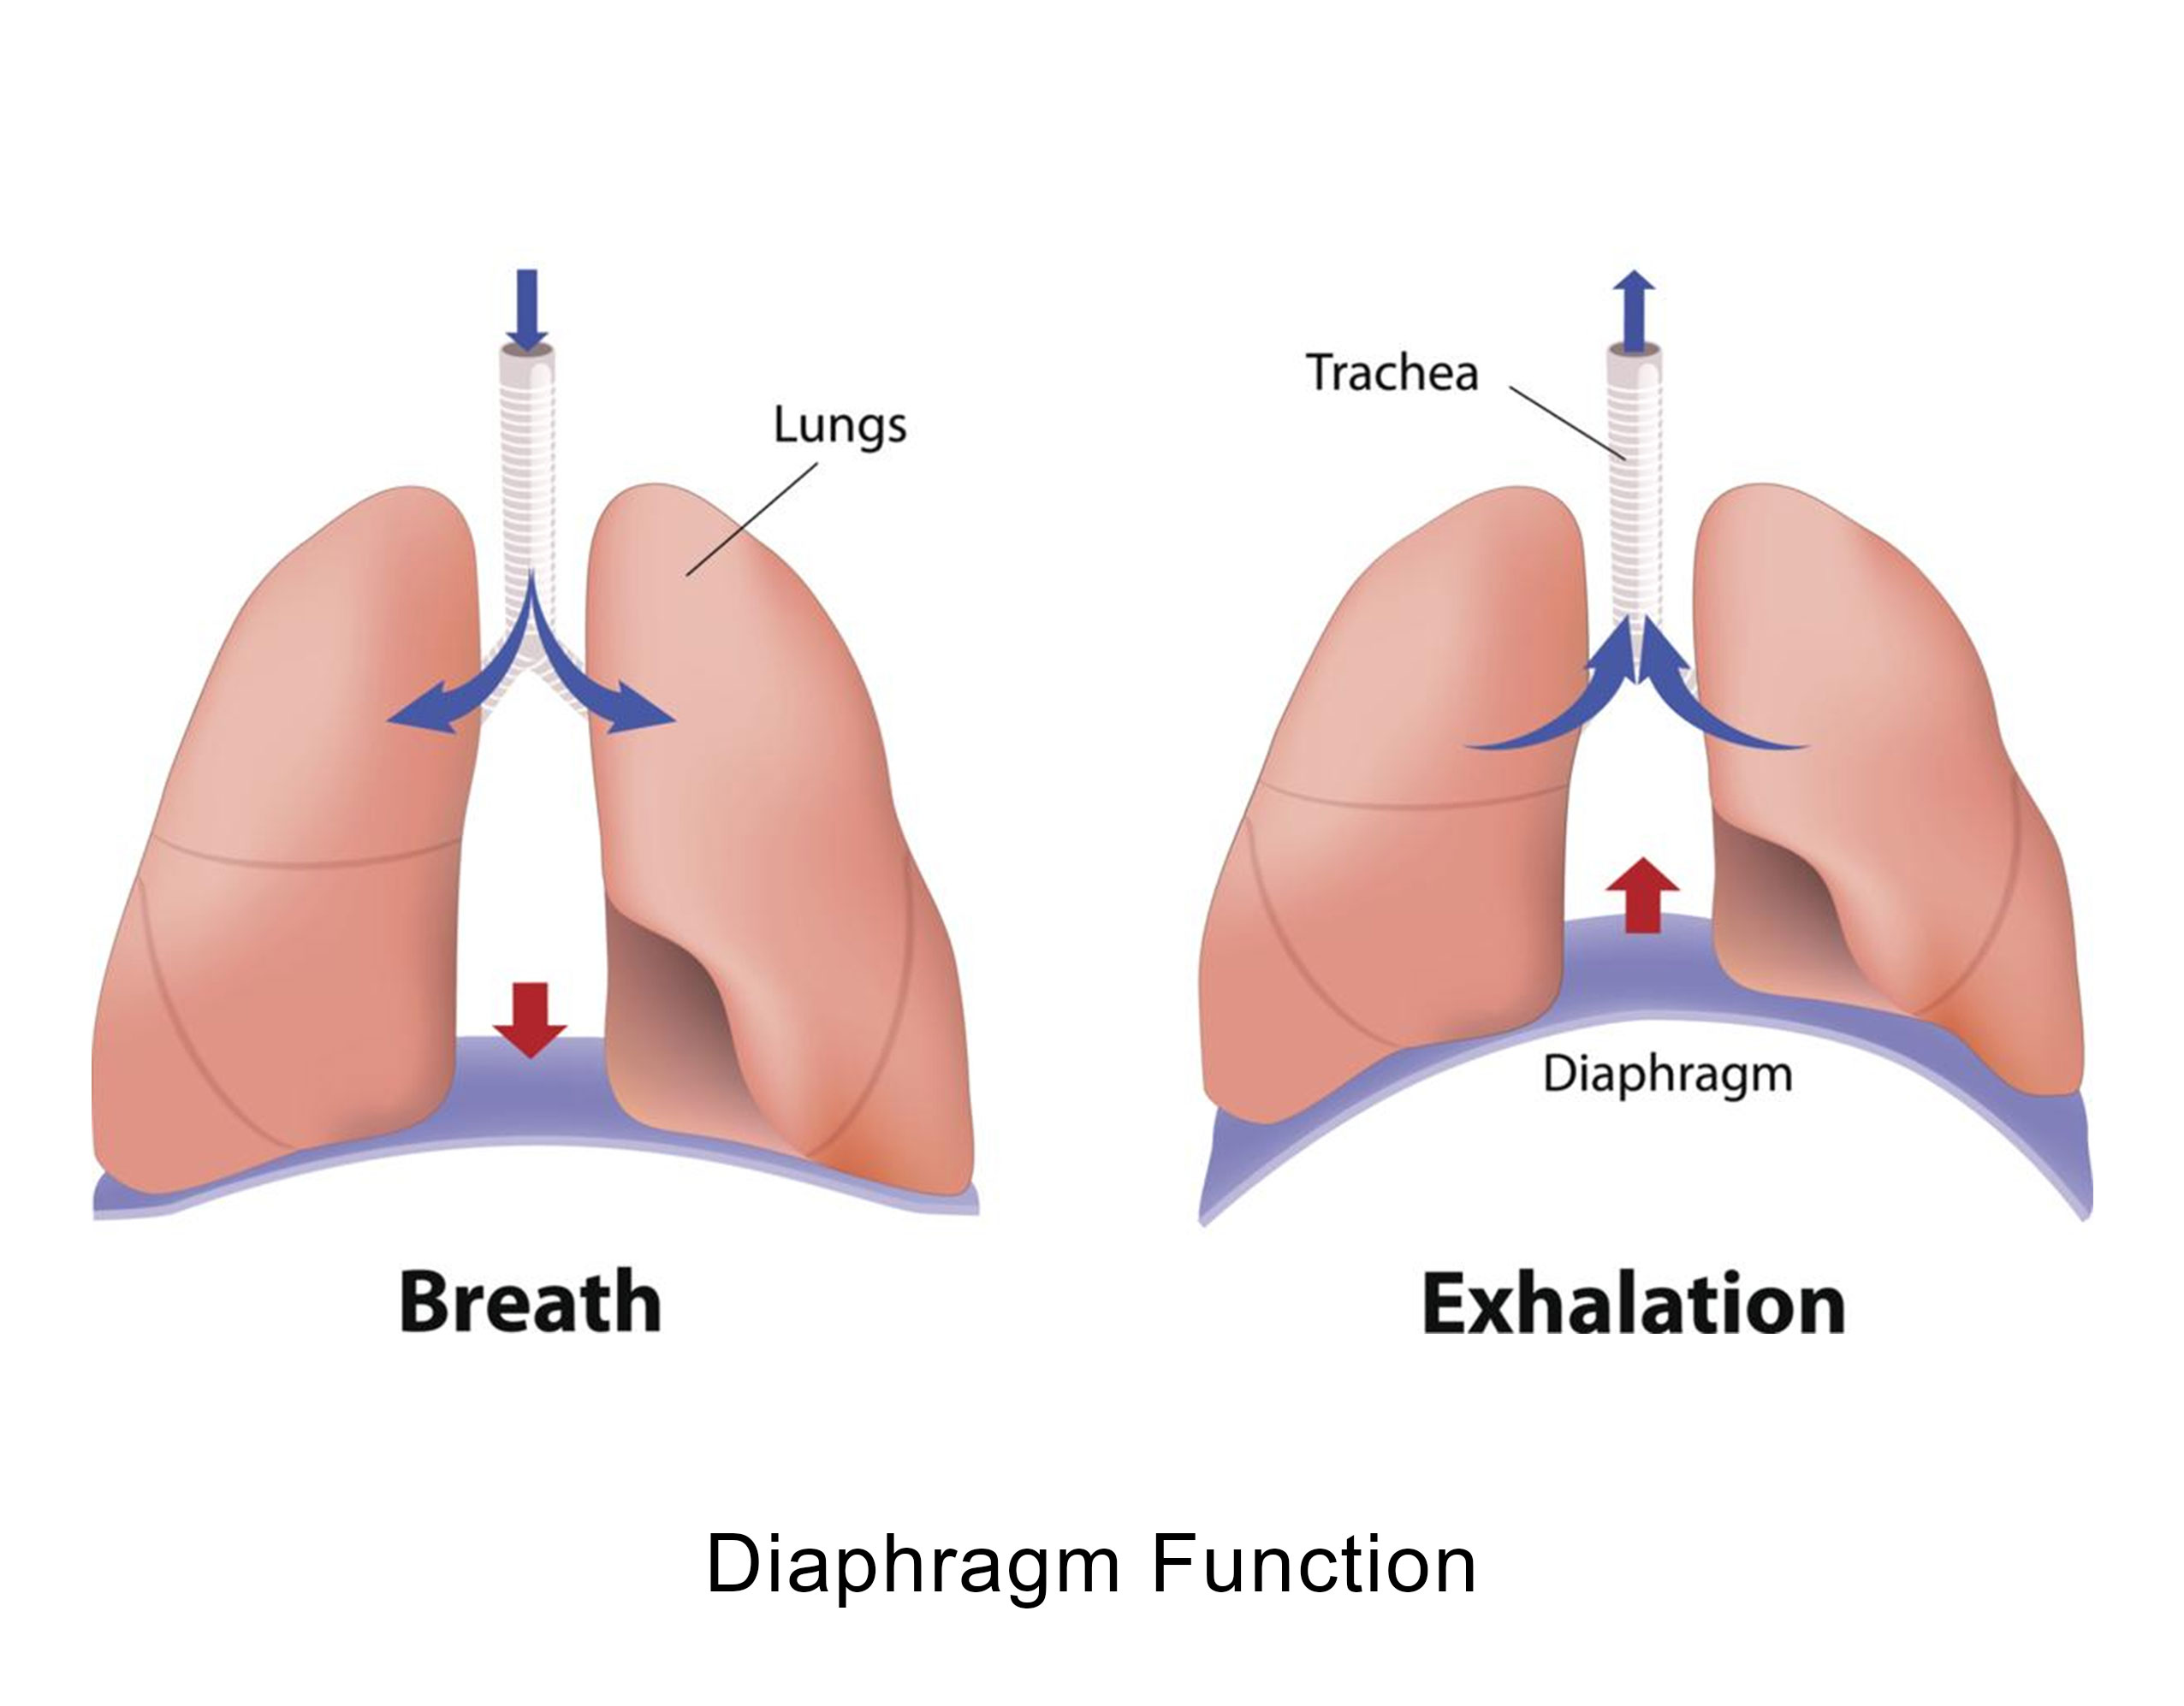 Diaphragm Function